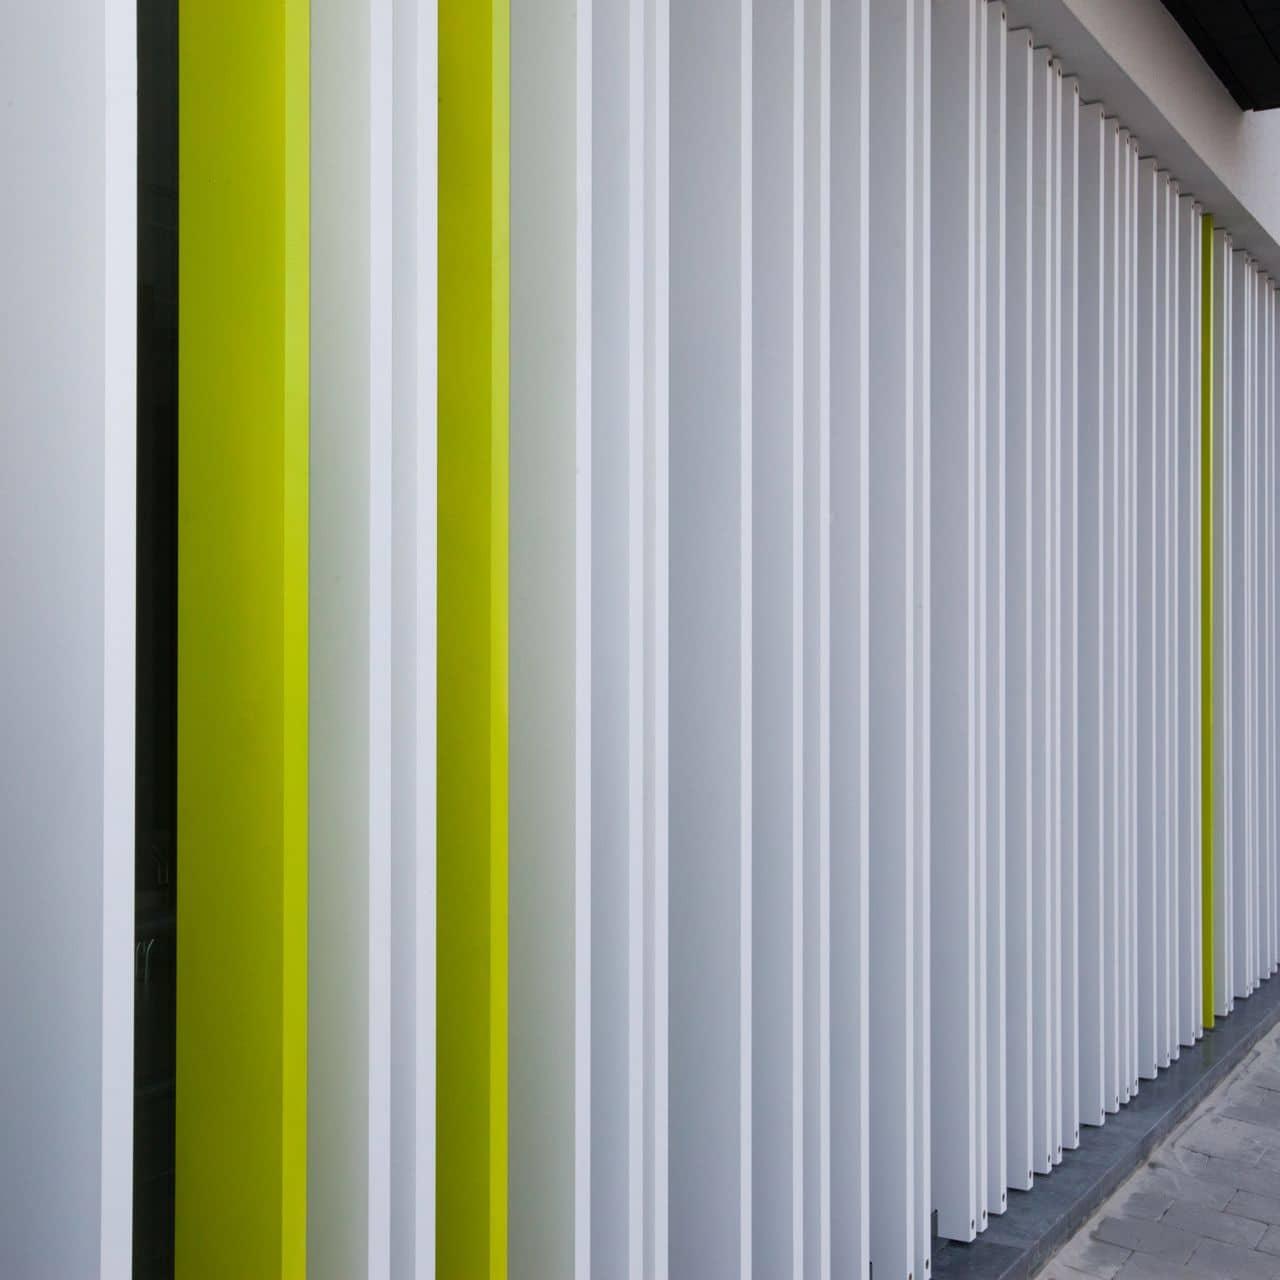 Upgrade Ter Plaeten123 | Baeyens & Beck architecten Gent | architect nieuwbouw renovatie interieur | high end | architectenbureau